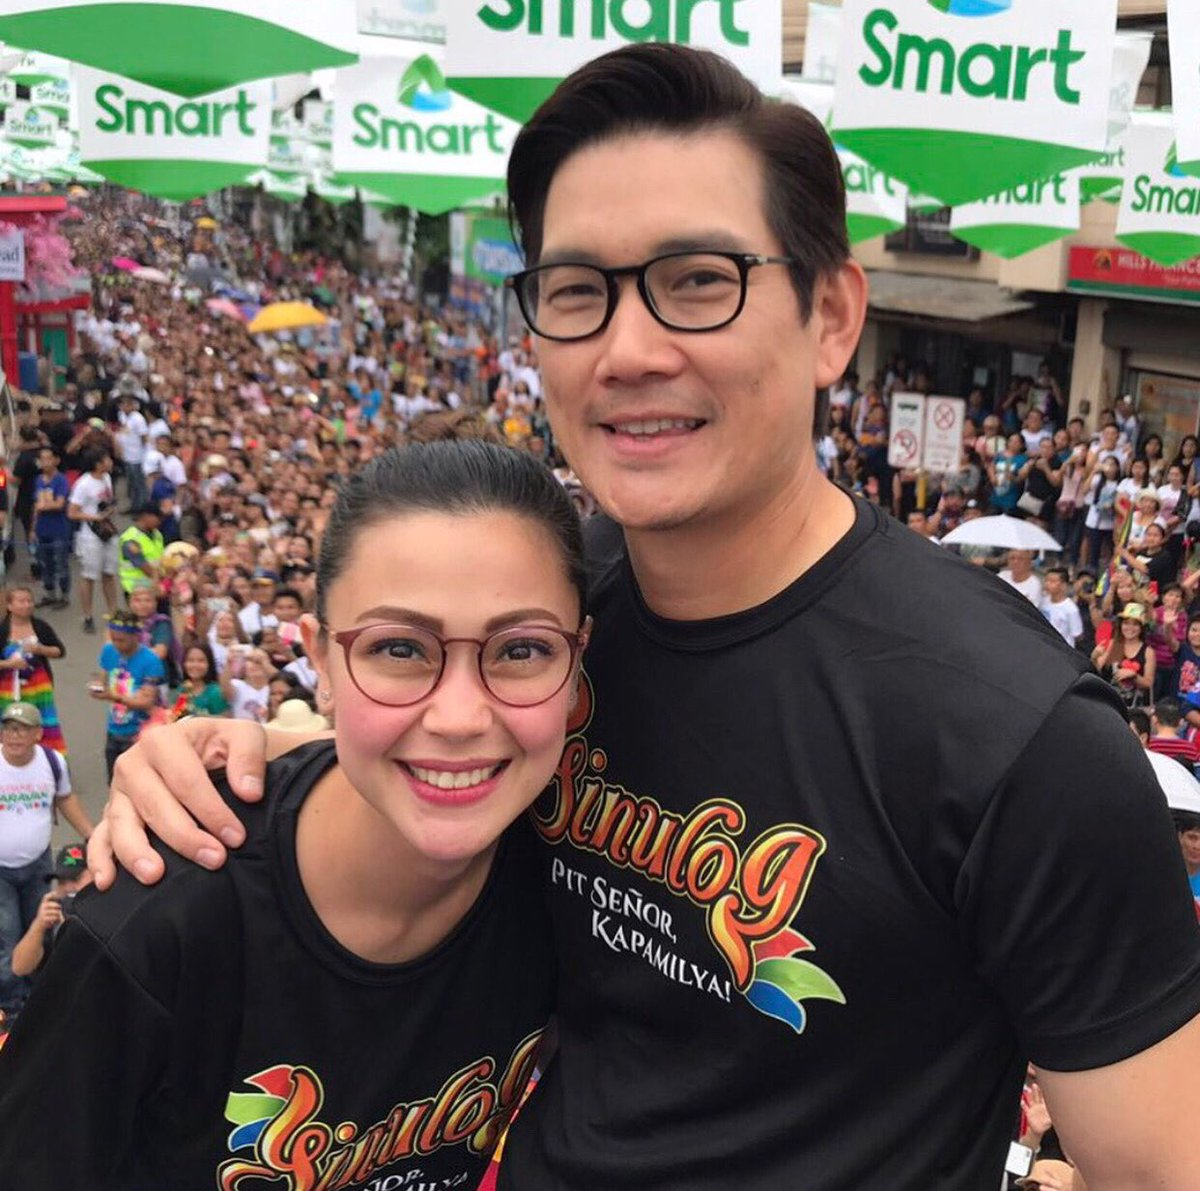 Will miss seeing you together today, but marami pa naman pong susunod, di ba?  JOCHARD OneTimeBigTime #S2PInvadesPampanga  #SanaDalawaAngPuso<br>http://pic.twitter.com/LhAc3UuAHH